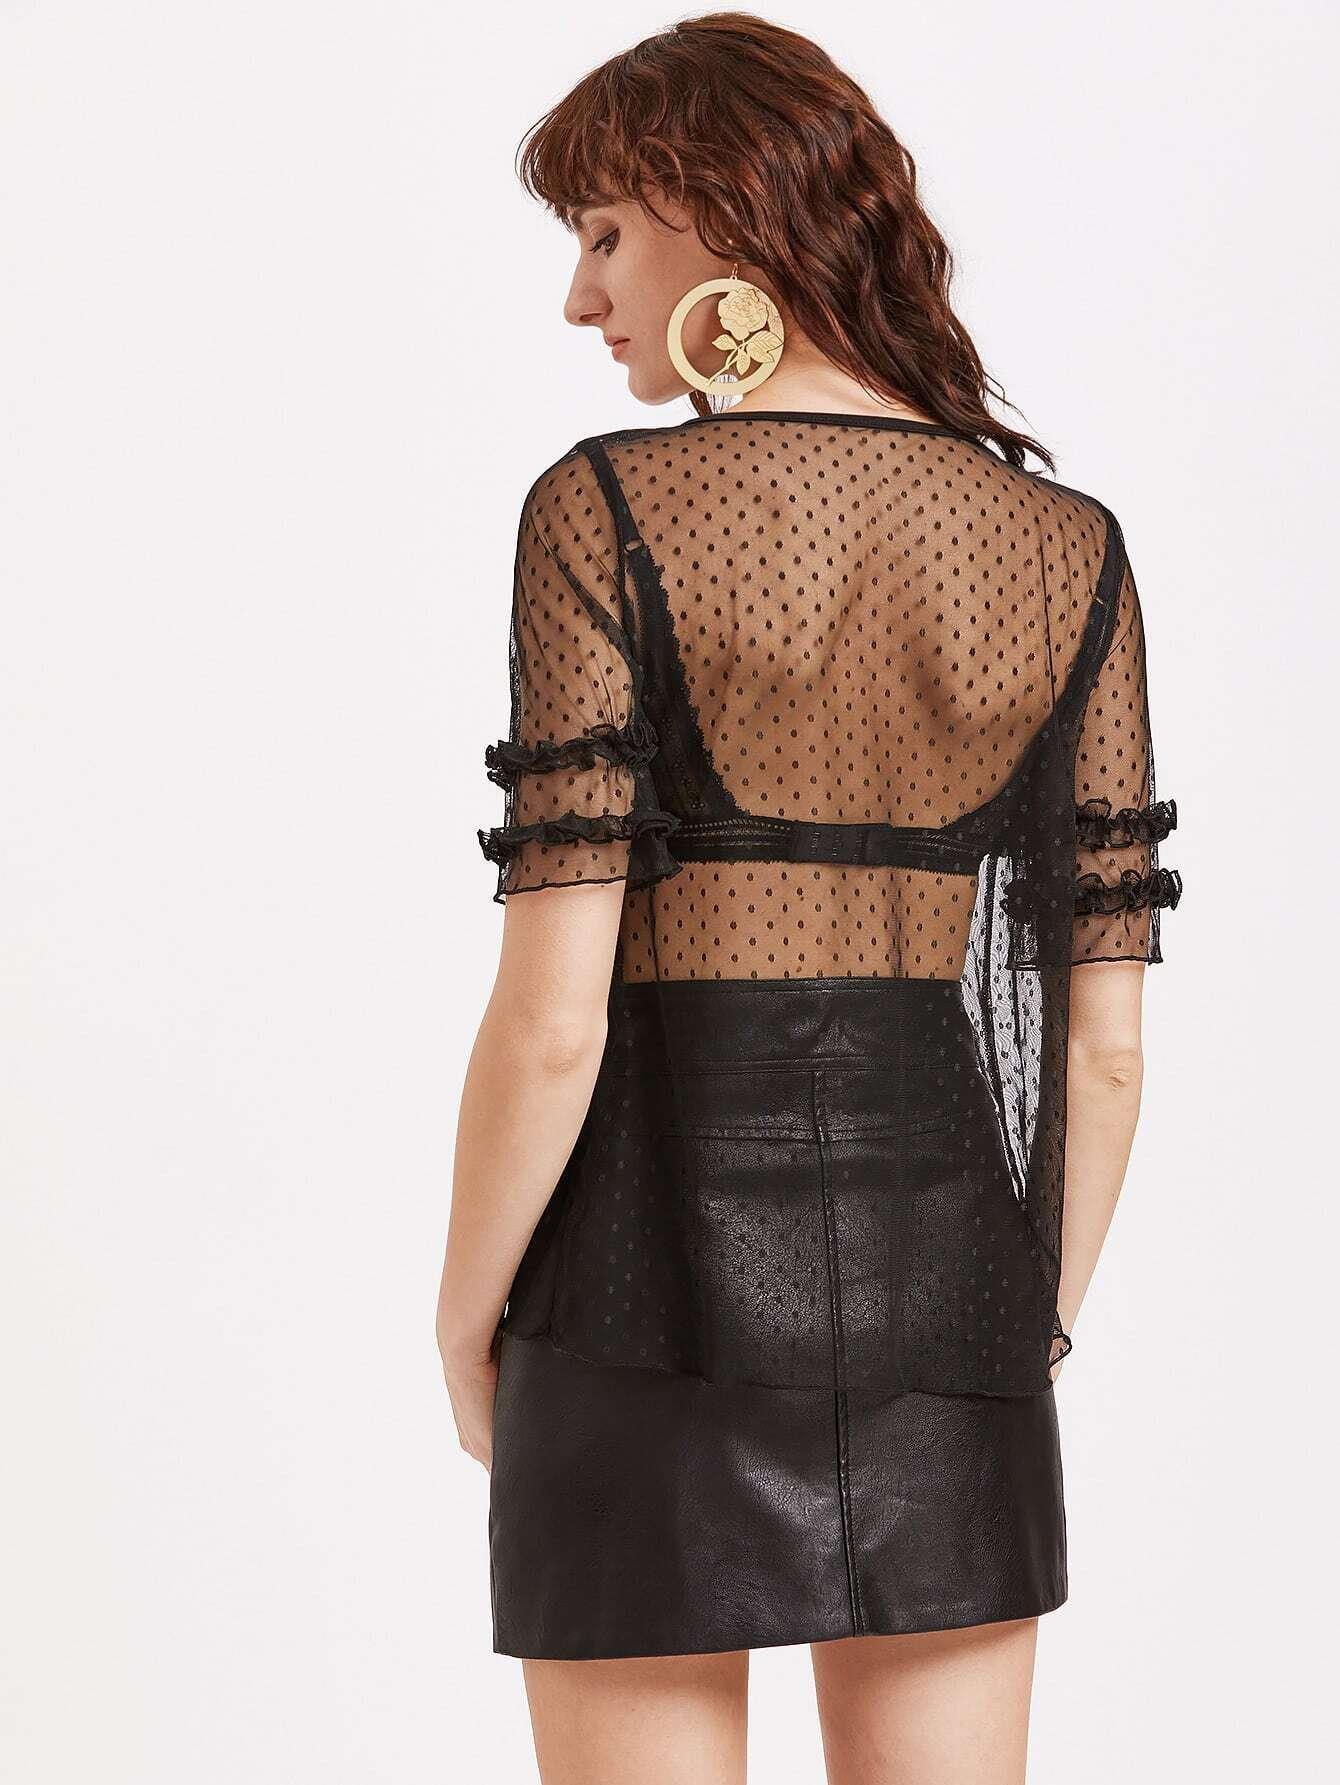 blouse170307453_2